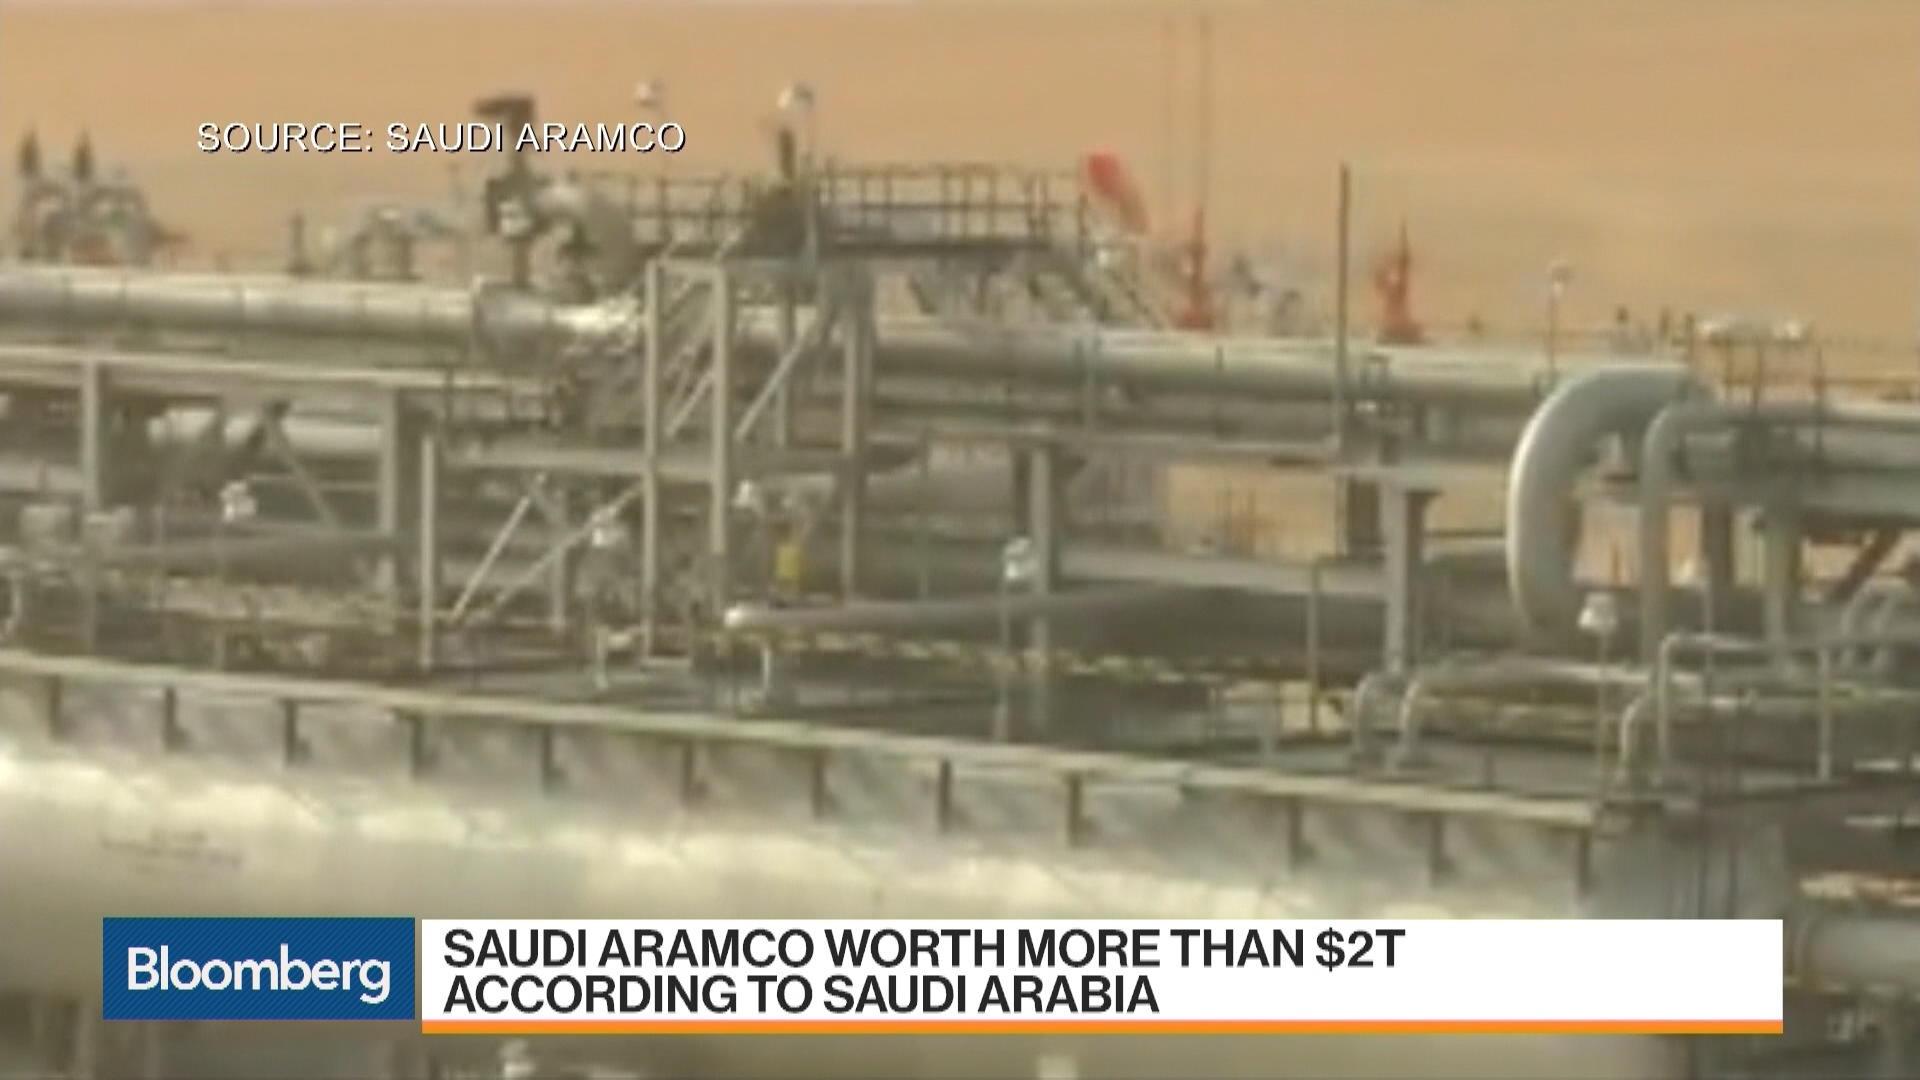 Saudi Arabia Says Aramco Is Worth More Than $2 Trillion